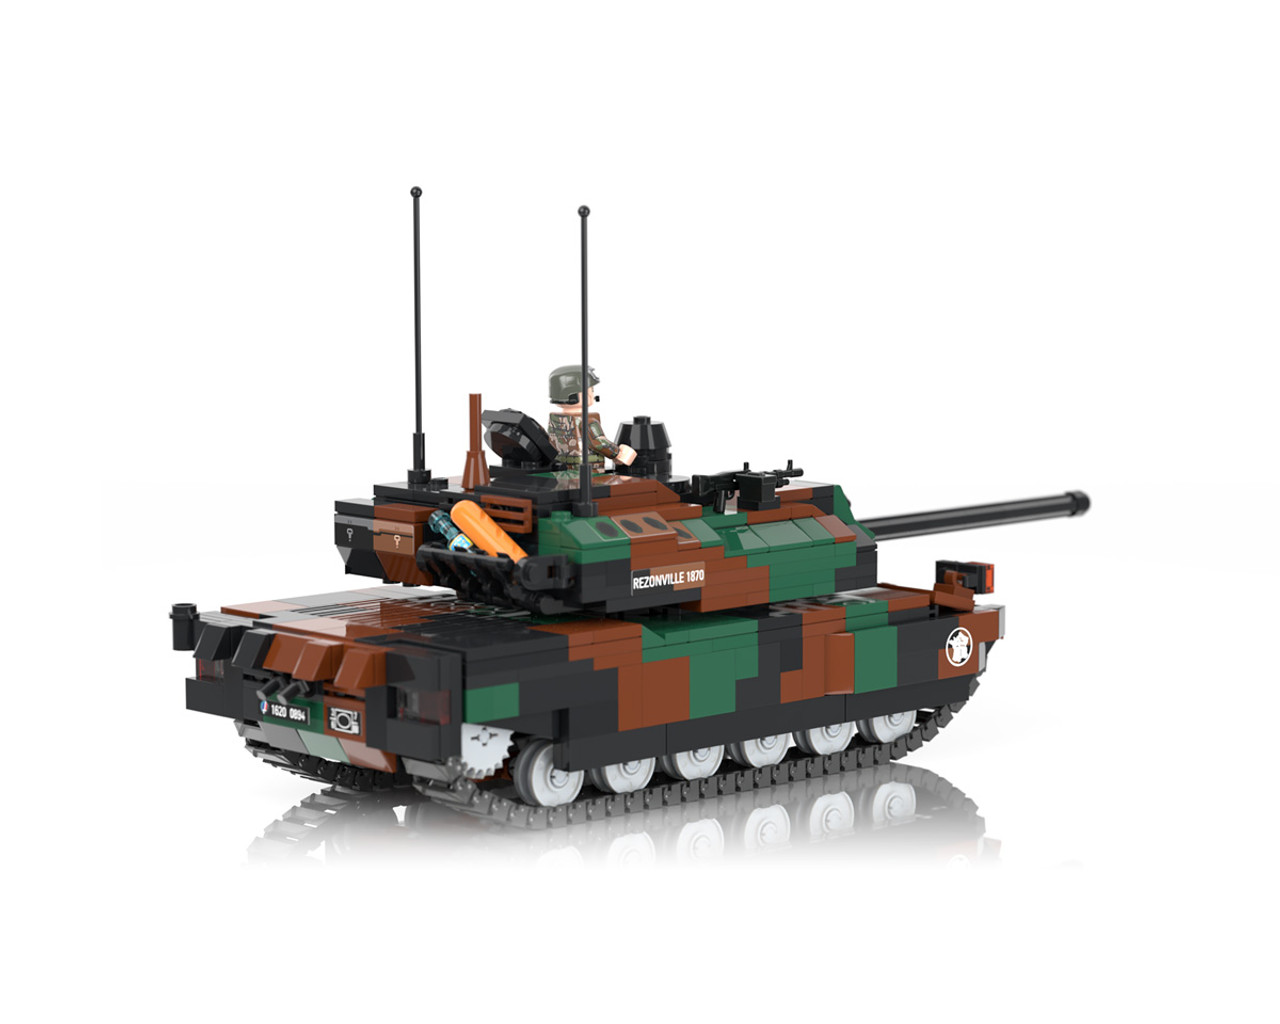 Leclerc Tank Battle Char Main Main Char Leclerc zVGqSMLUp